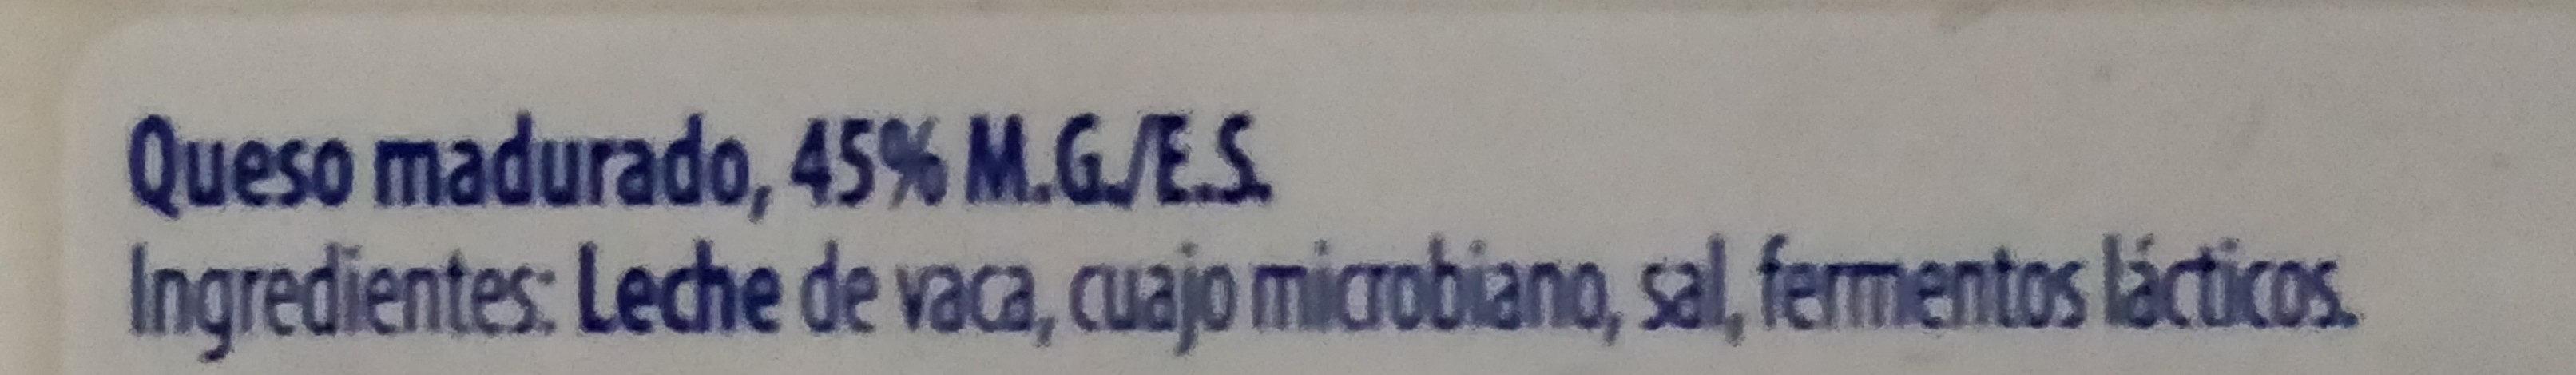 Queso madurado - Ingredientes